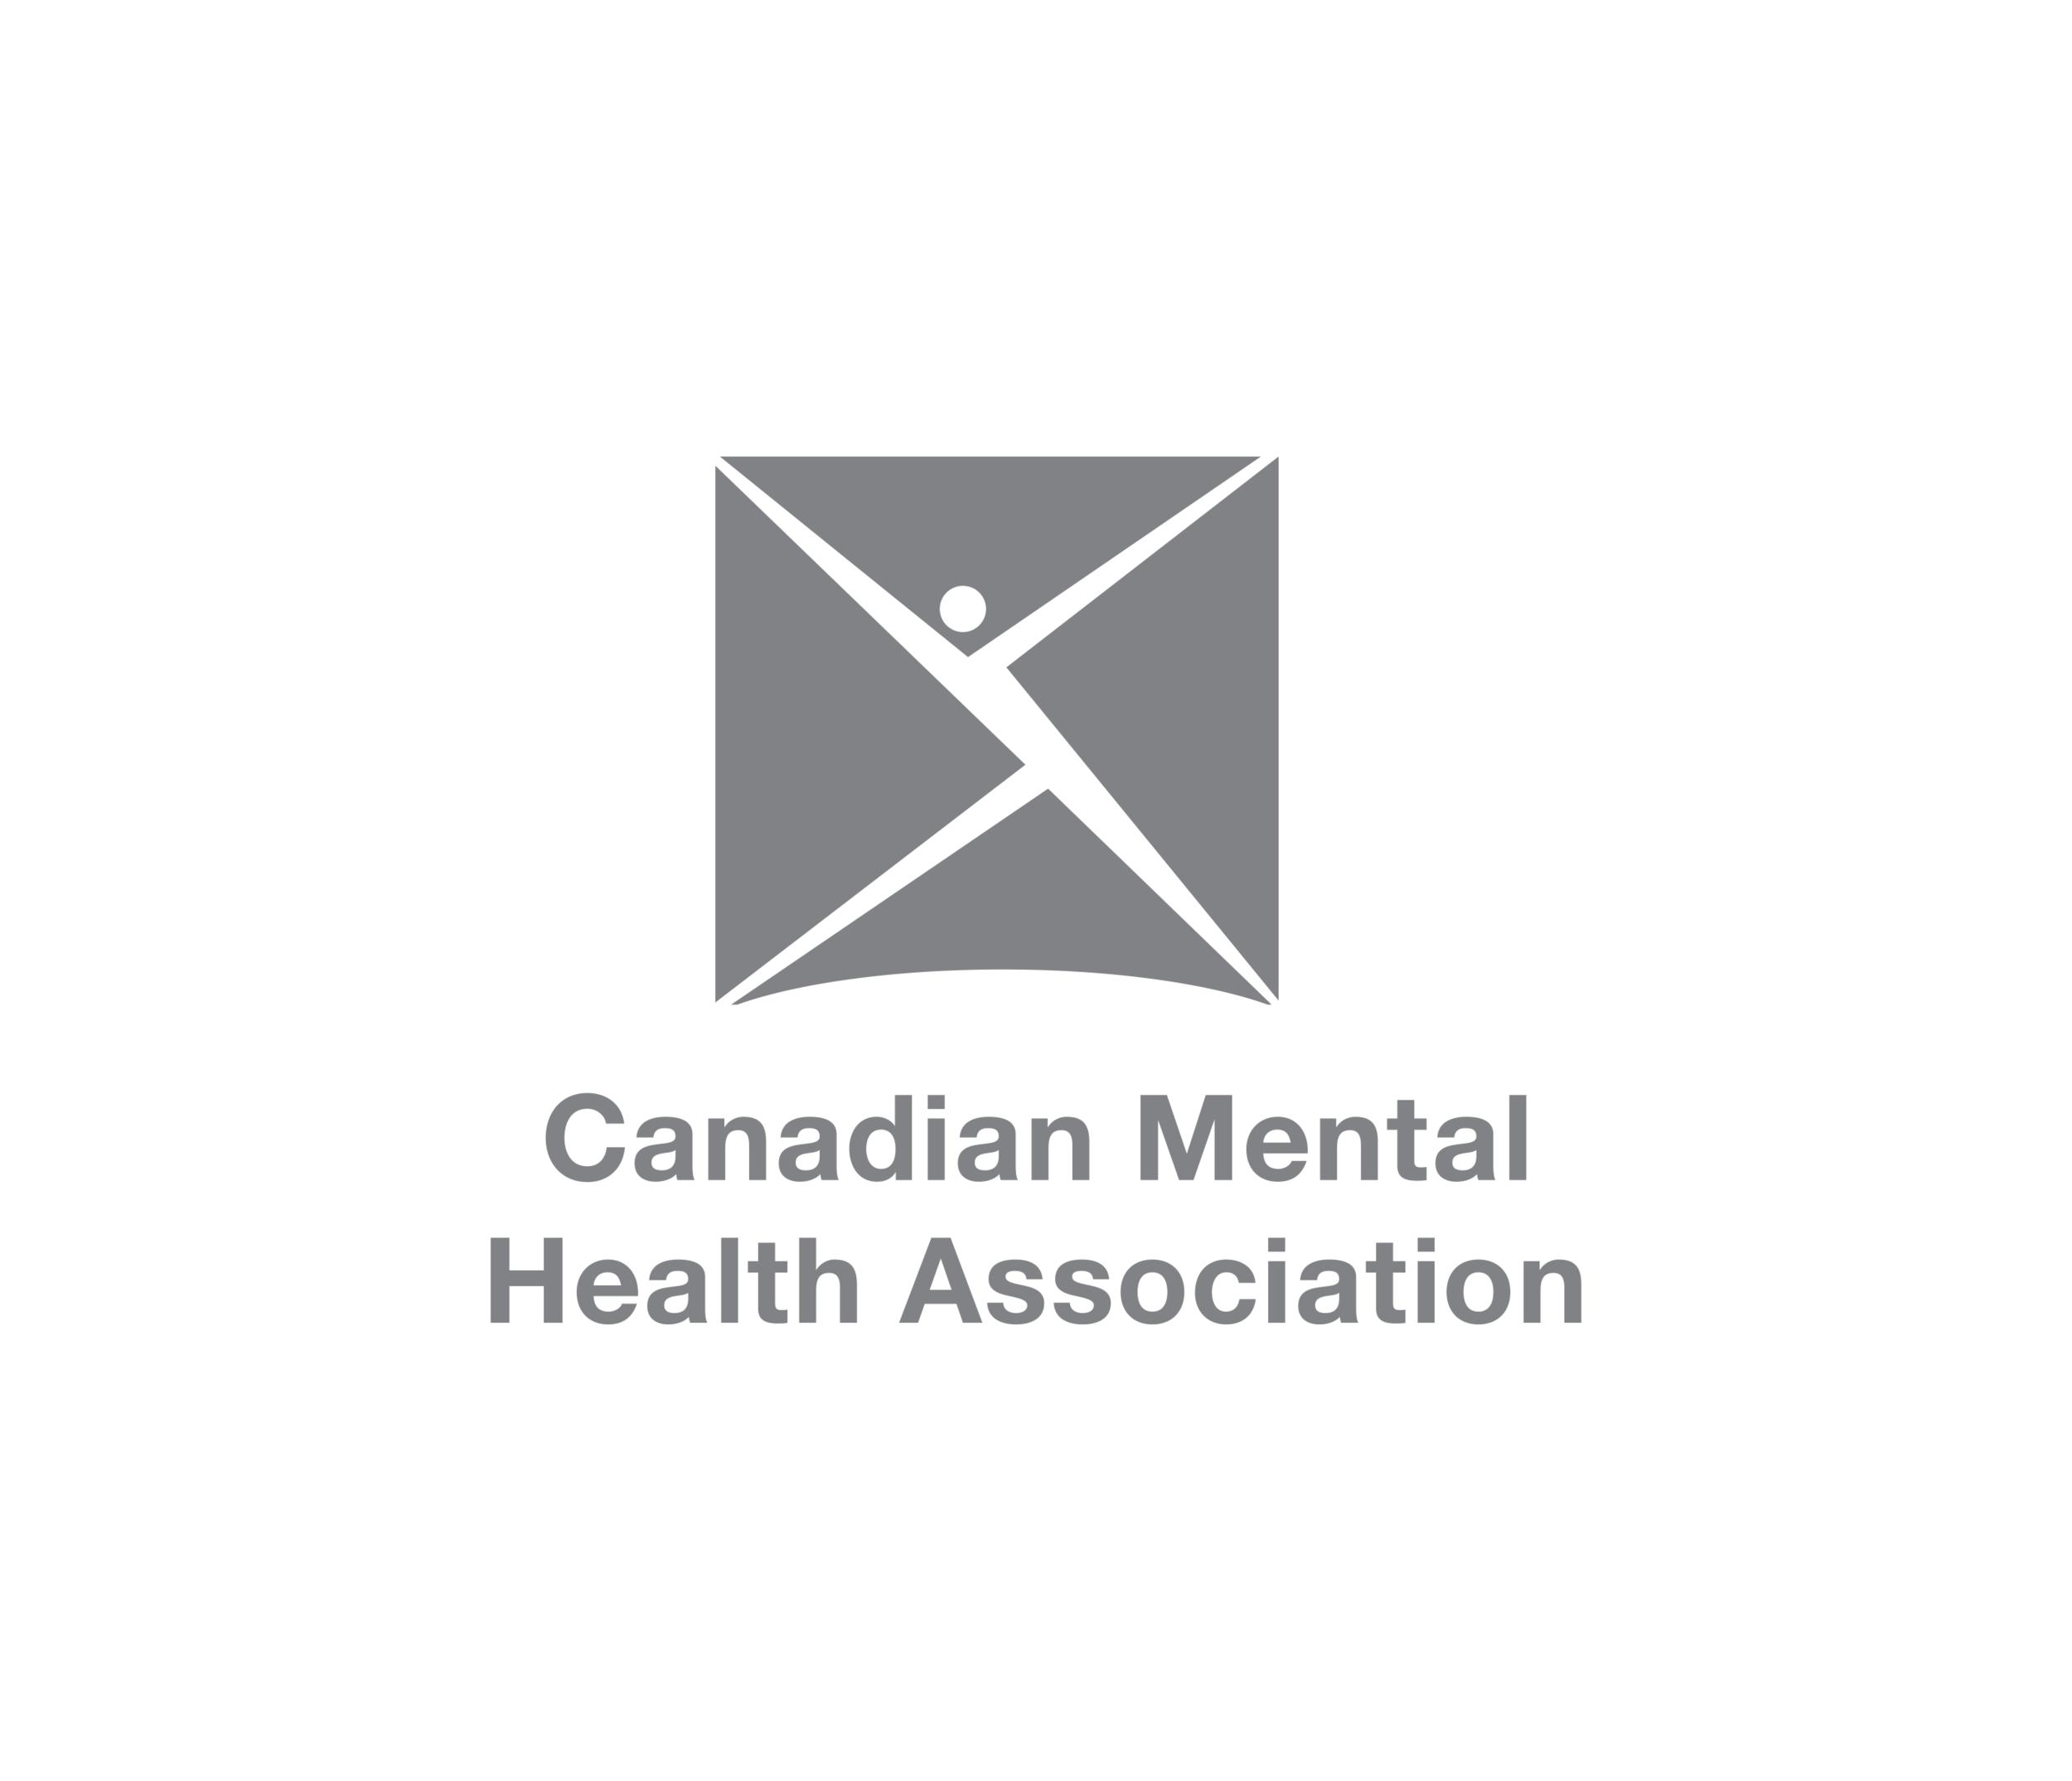 Canadian Mental Logo.png